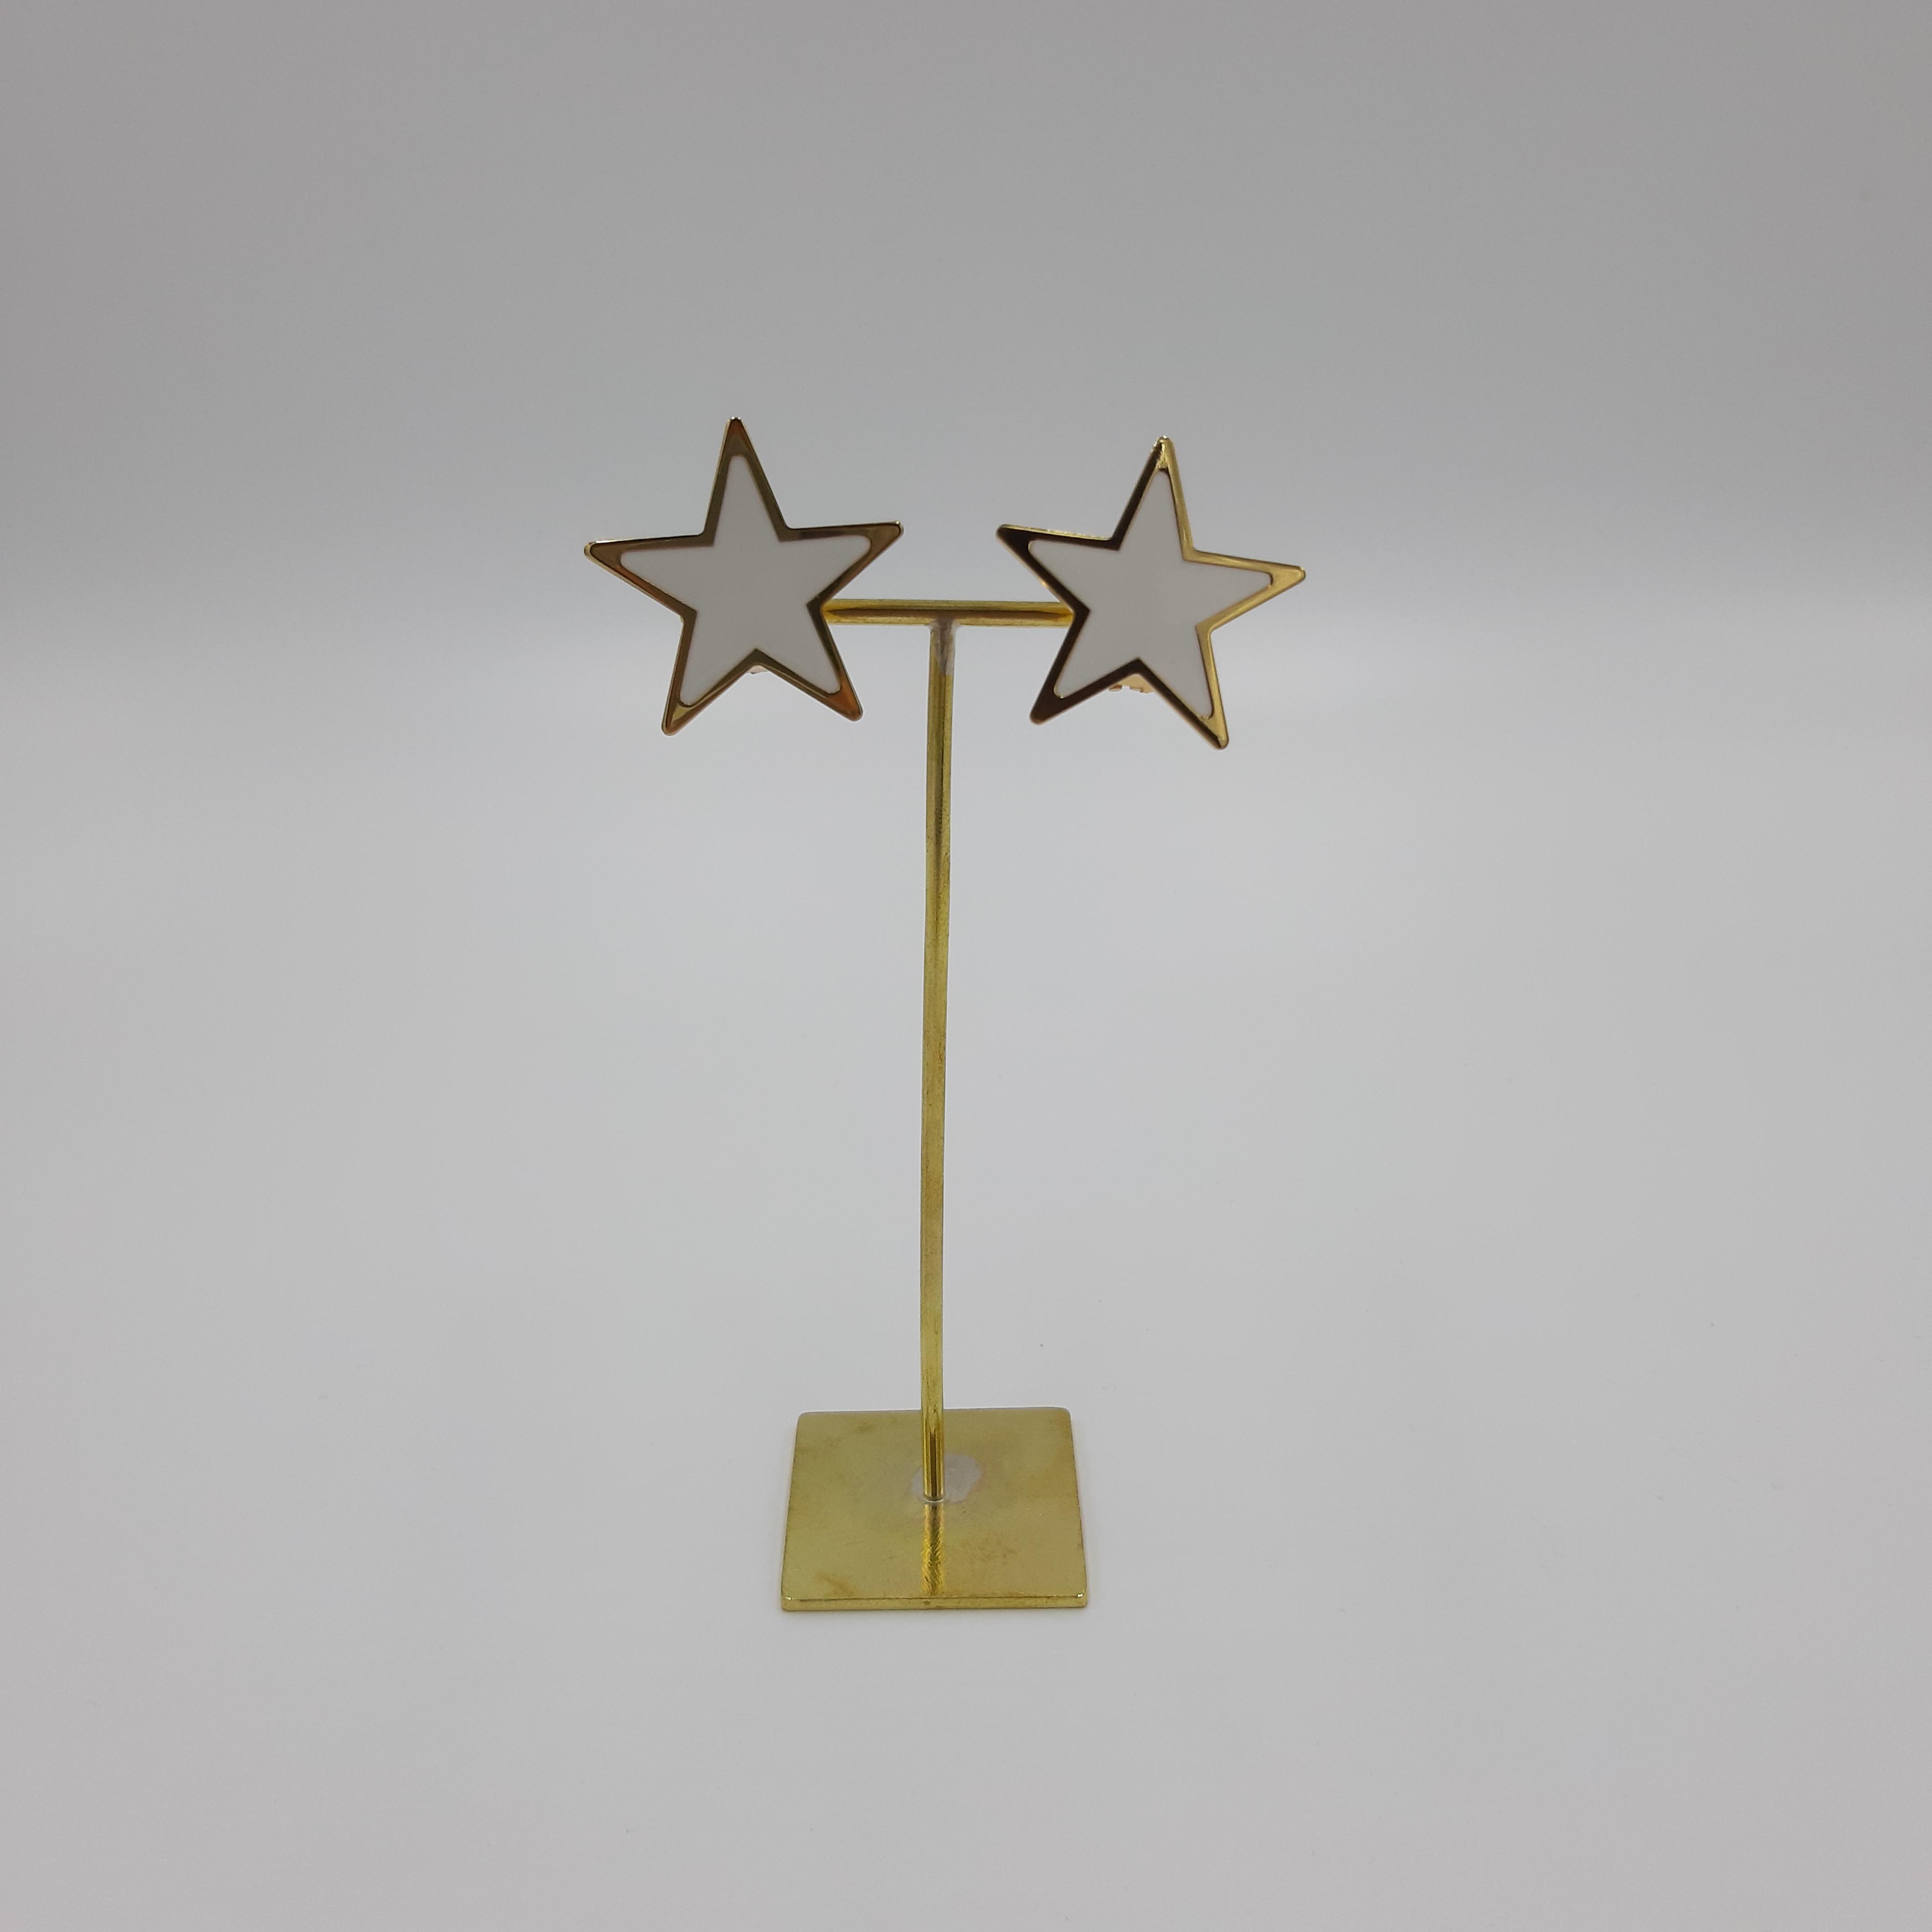 Orecchini stella grandi bianchi Francesca Bianchi Design